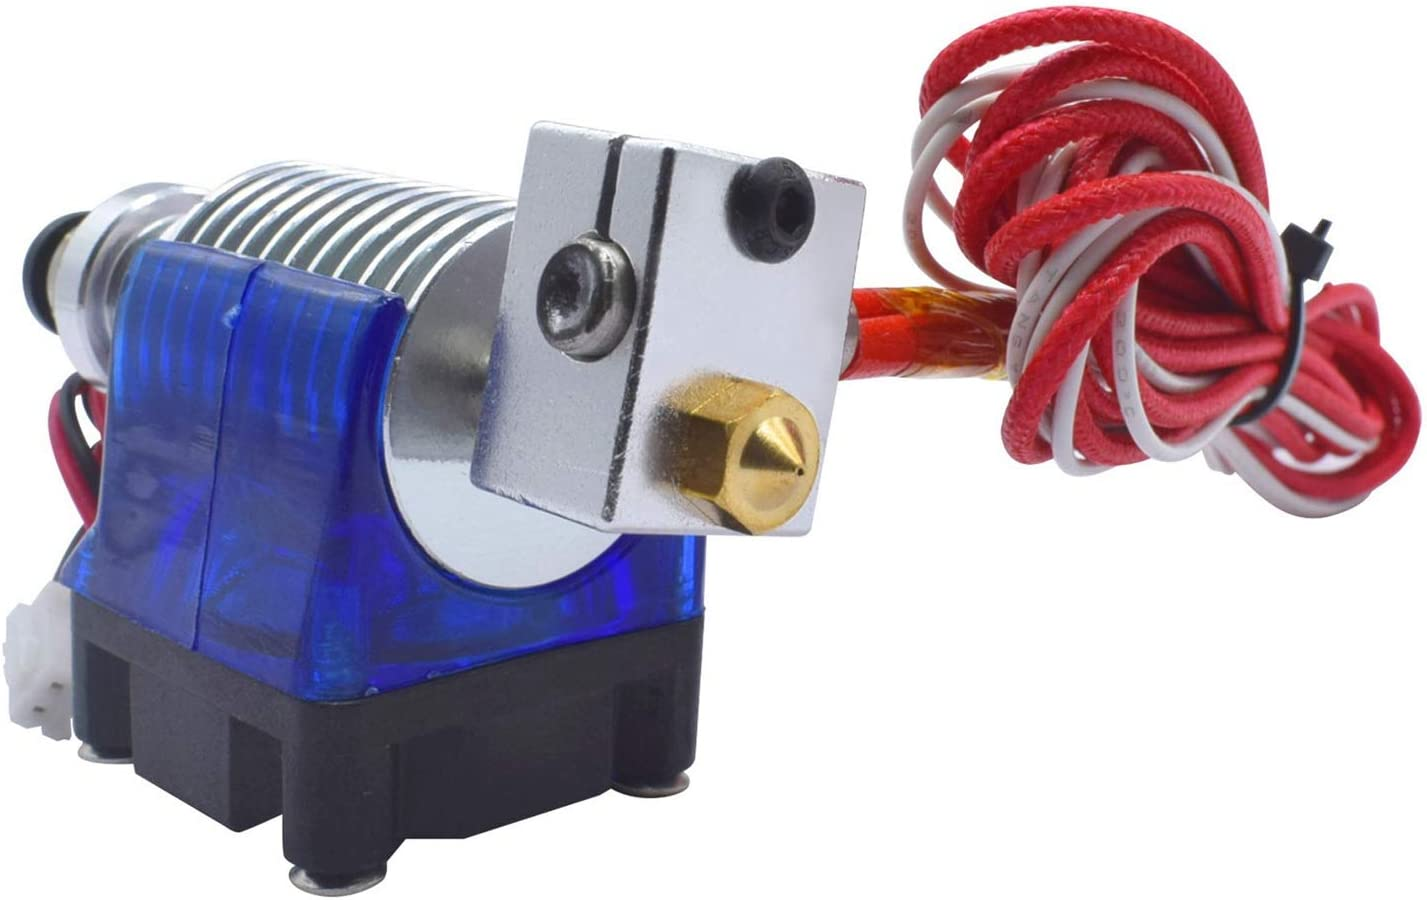 Garganta de Boquilla de 5 Piezas para Impresoras 3D V6 Makerbot Reprap 24V Nrpfell Kit Completo Hotend de Cabeza de Estilo J con Cabezal de Impresi/óN de Extrusora de 5 Piezas